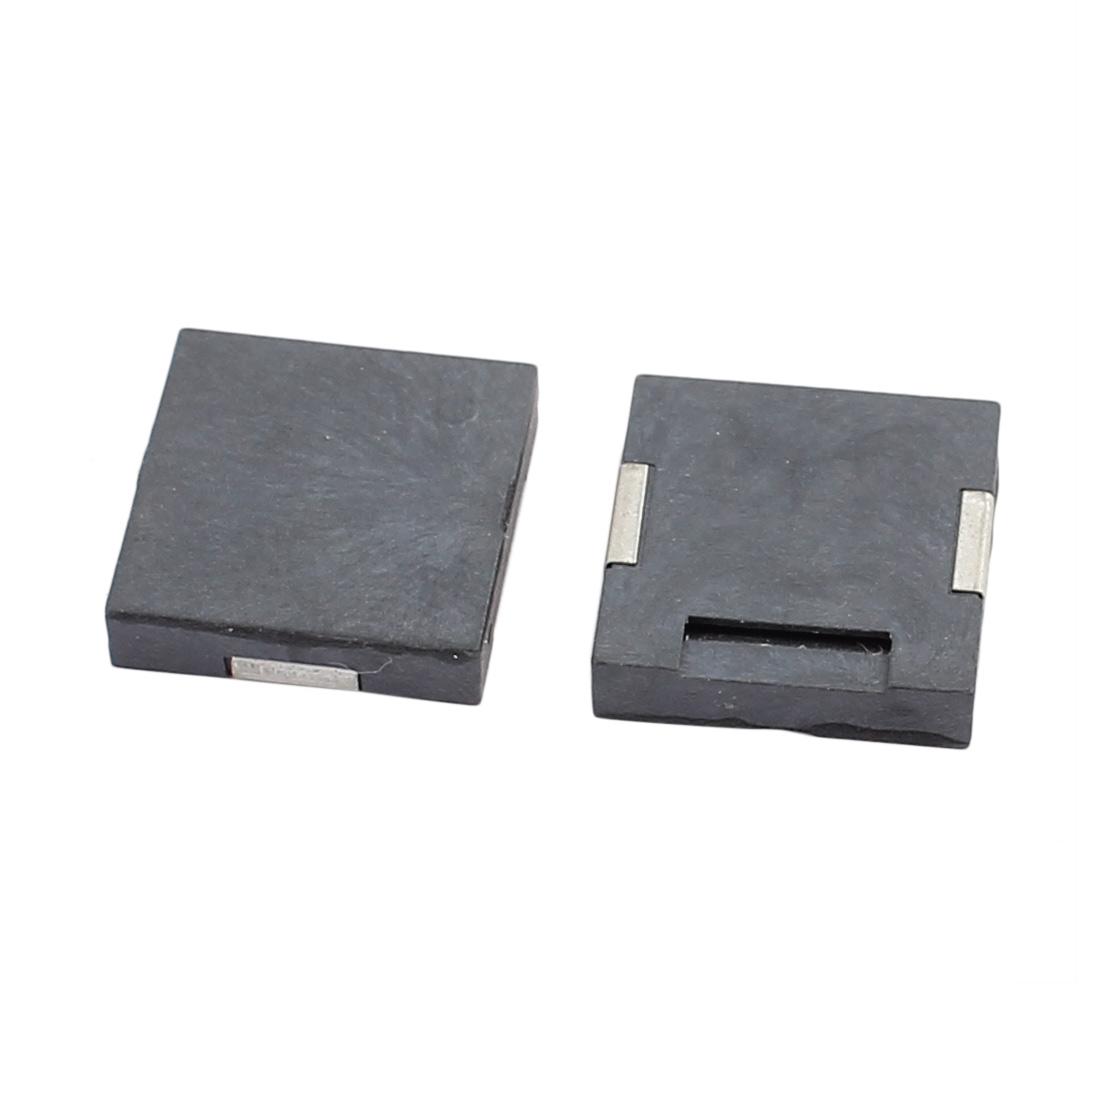 2pcs-DC-1-25V-12mm-x-12mm-x-3mm-Zumbador-SMD-pasivo-electromagnetico-negro